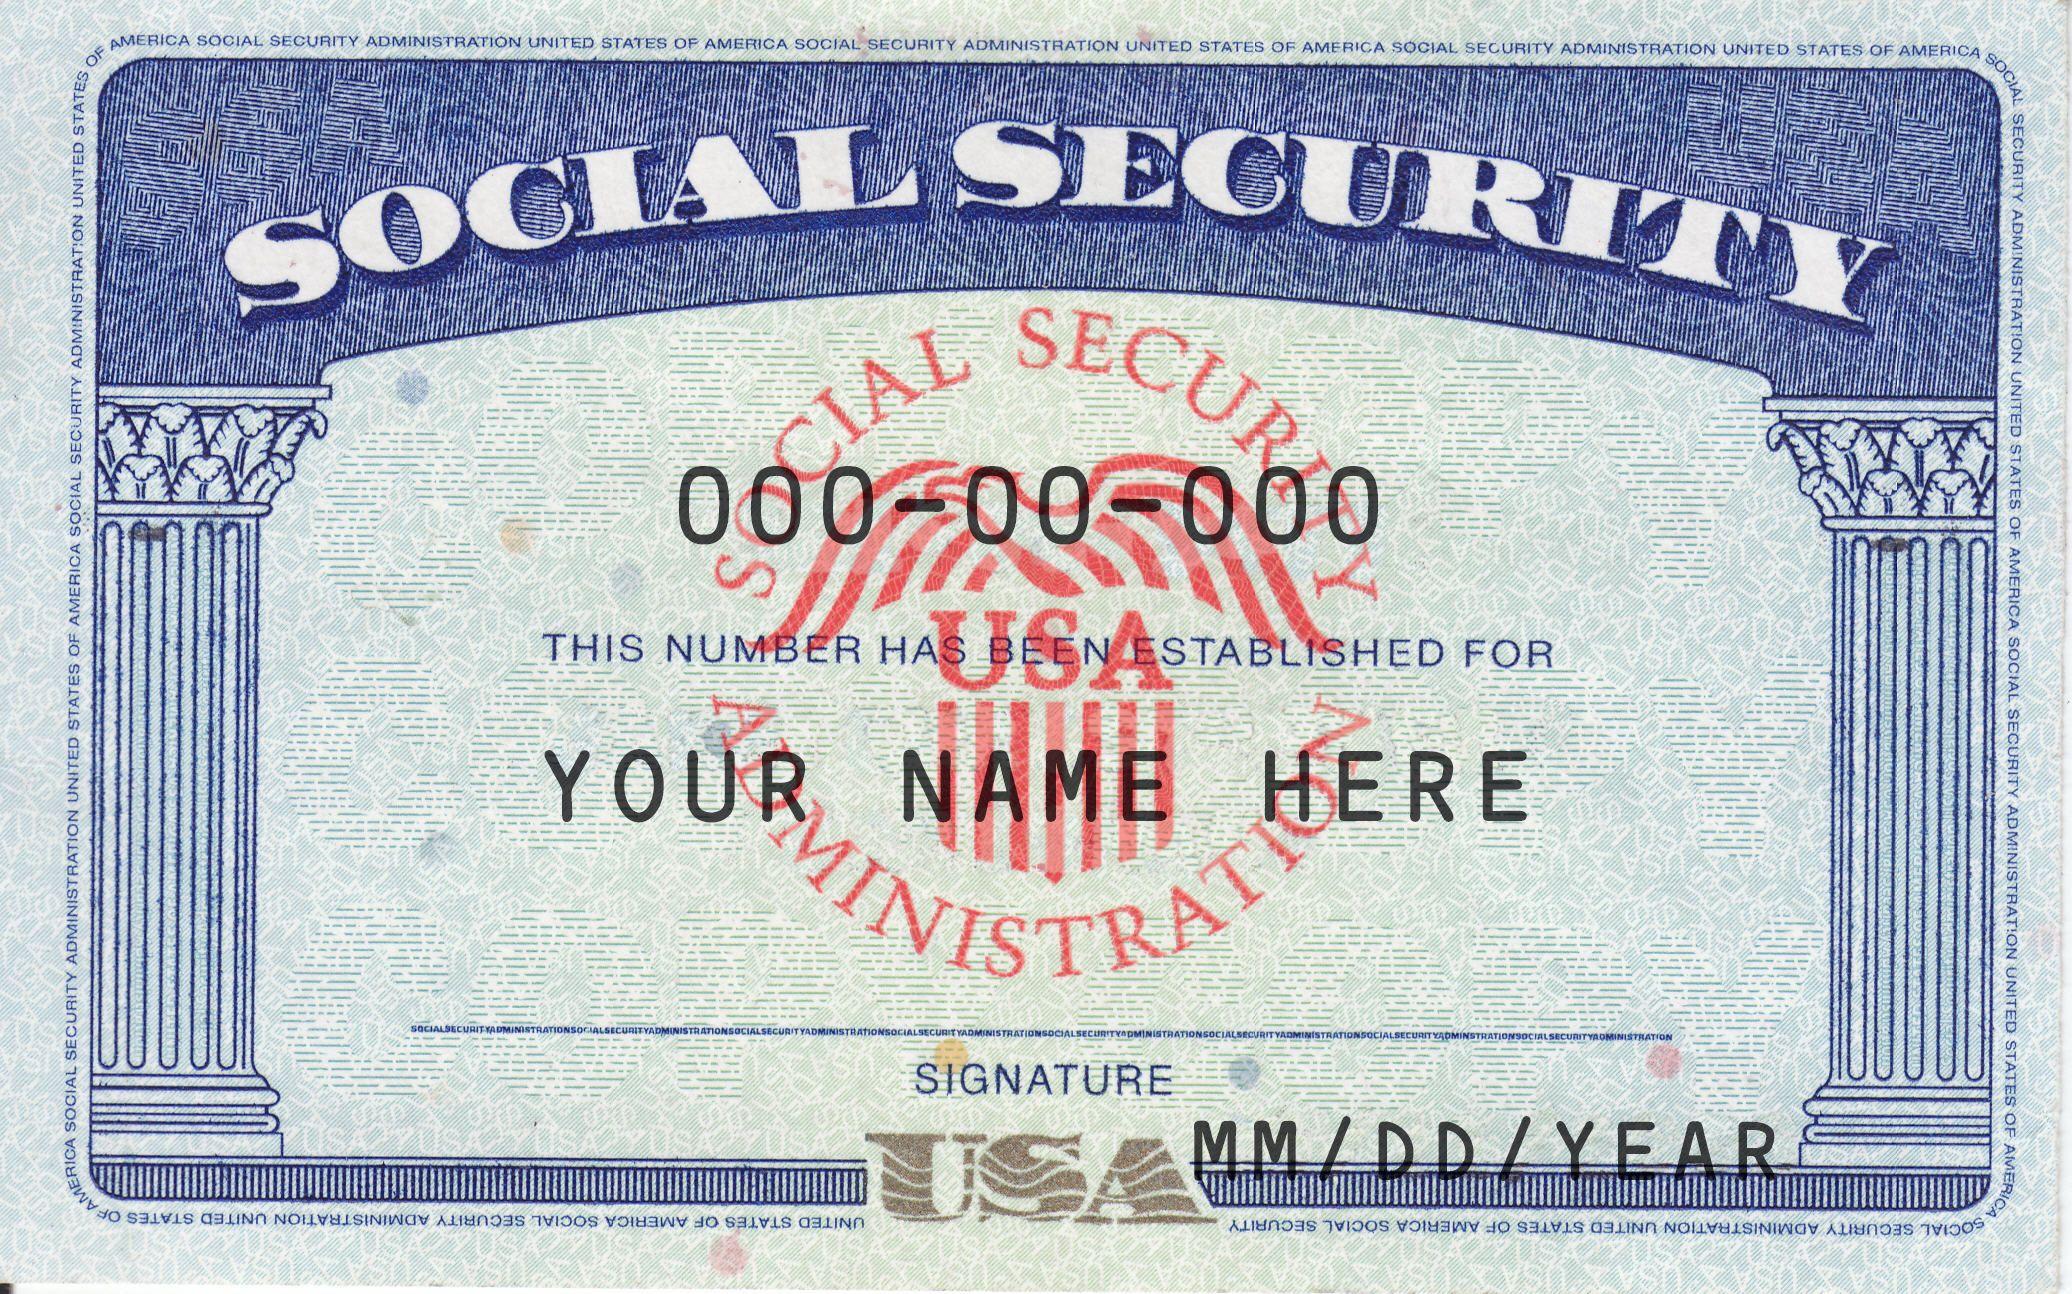 544966a79973a61e96c0c3ddaf12c732 - How To Get A Social Security Number In California